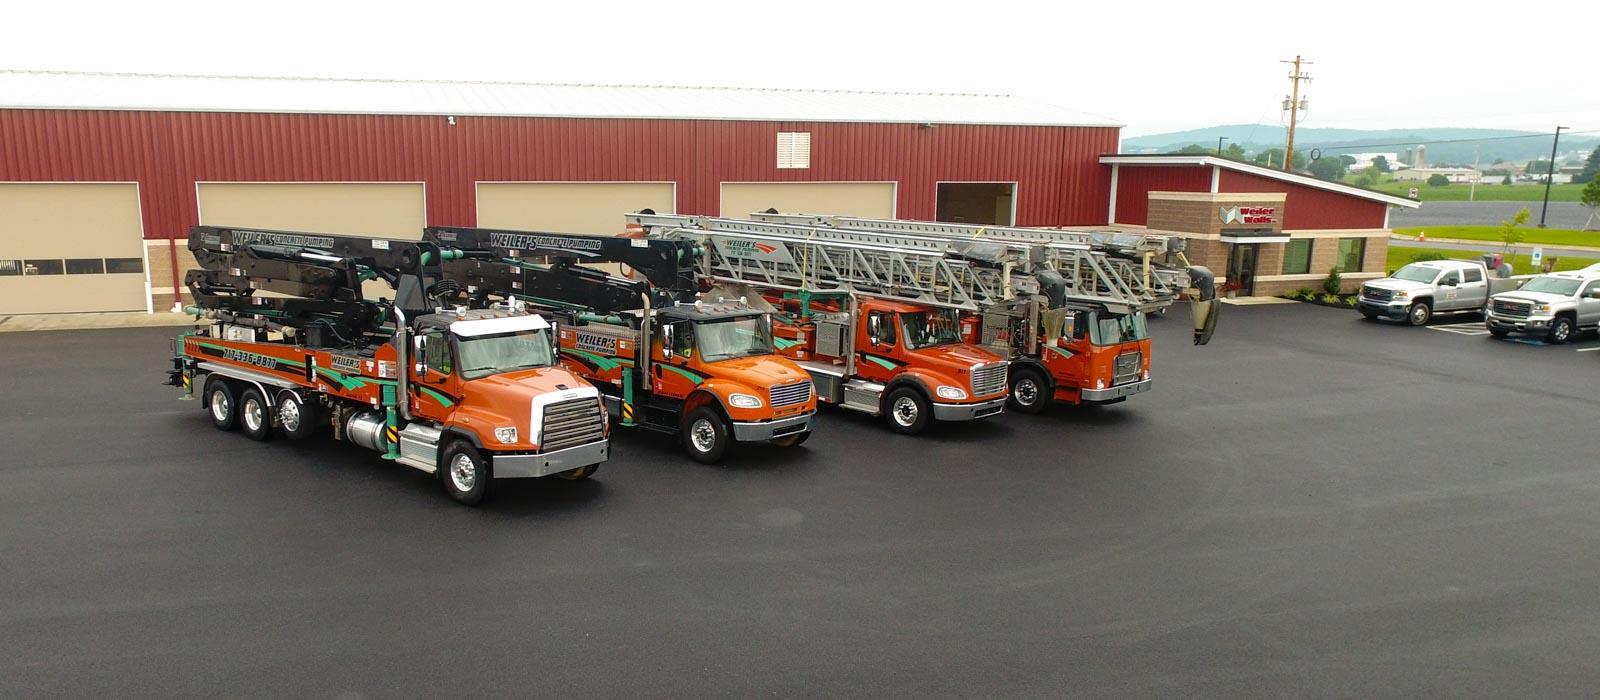 Telebelt and Concrete Pump Trucks